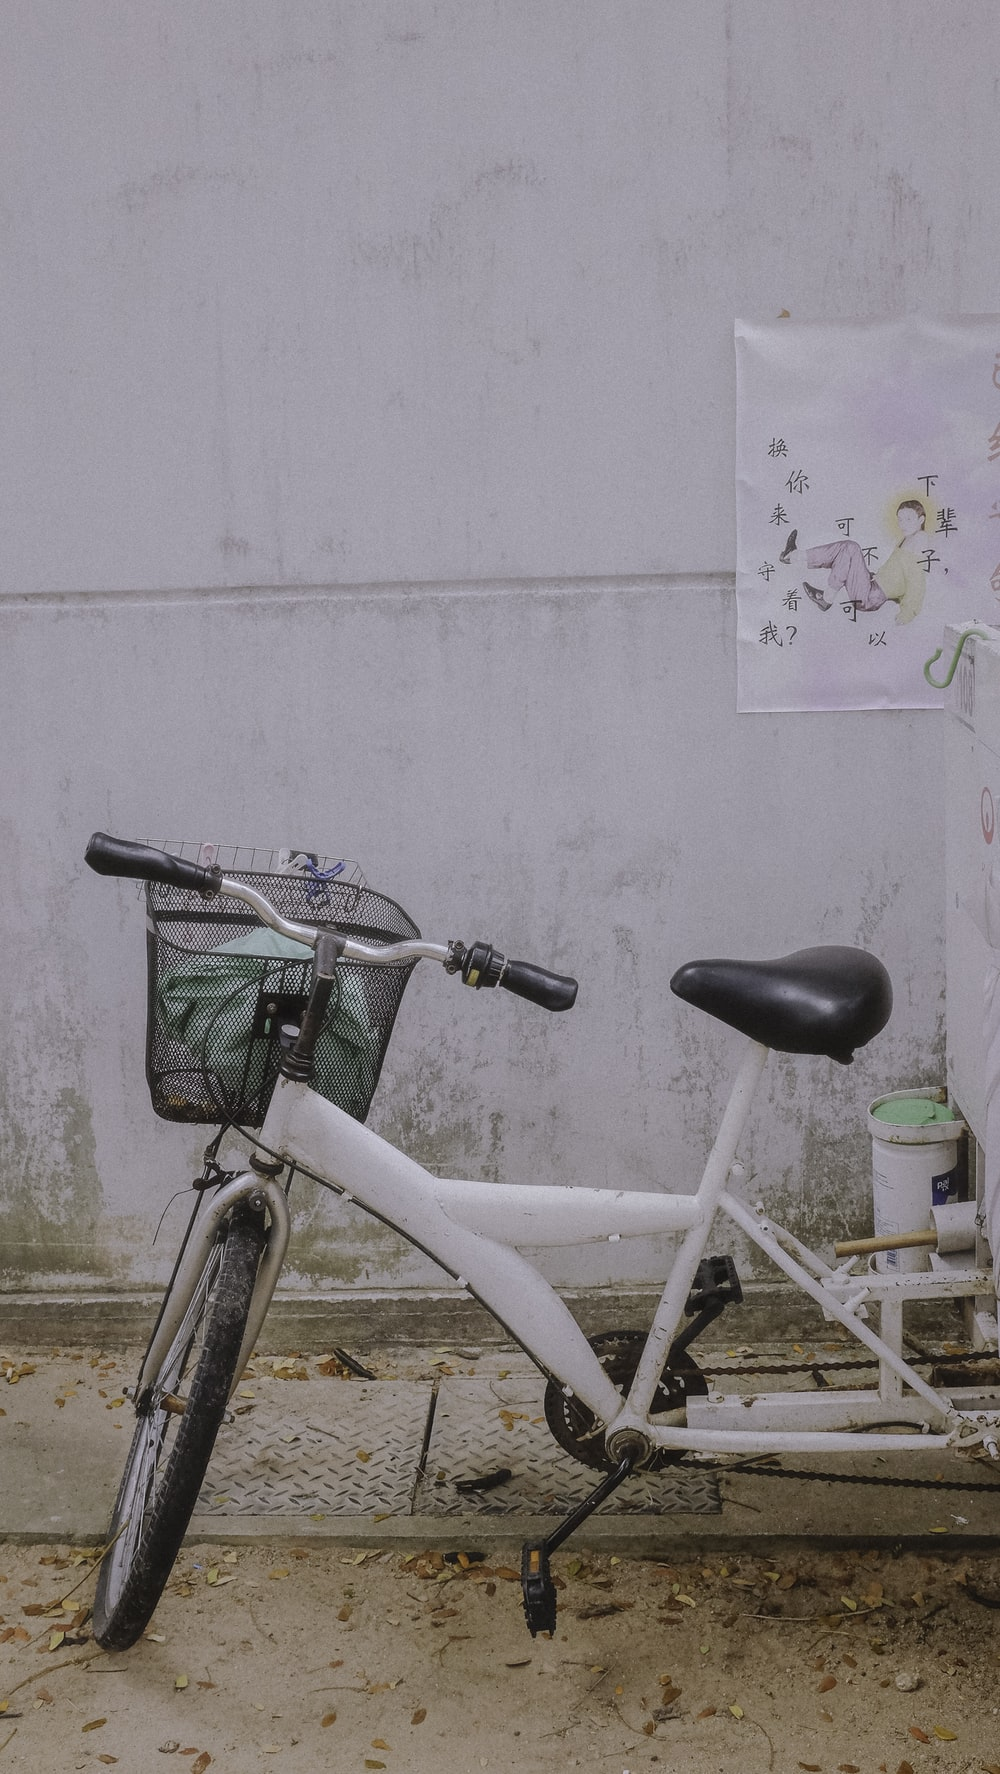 white and black city bike